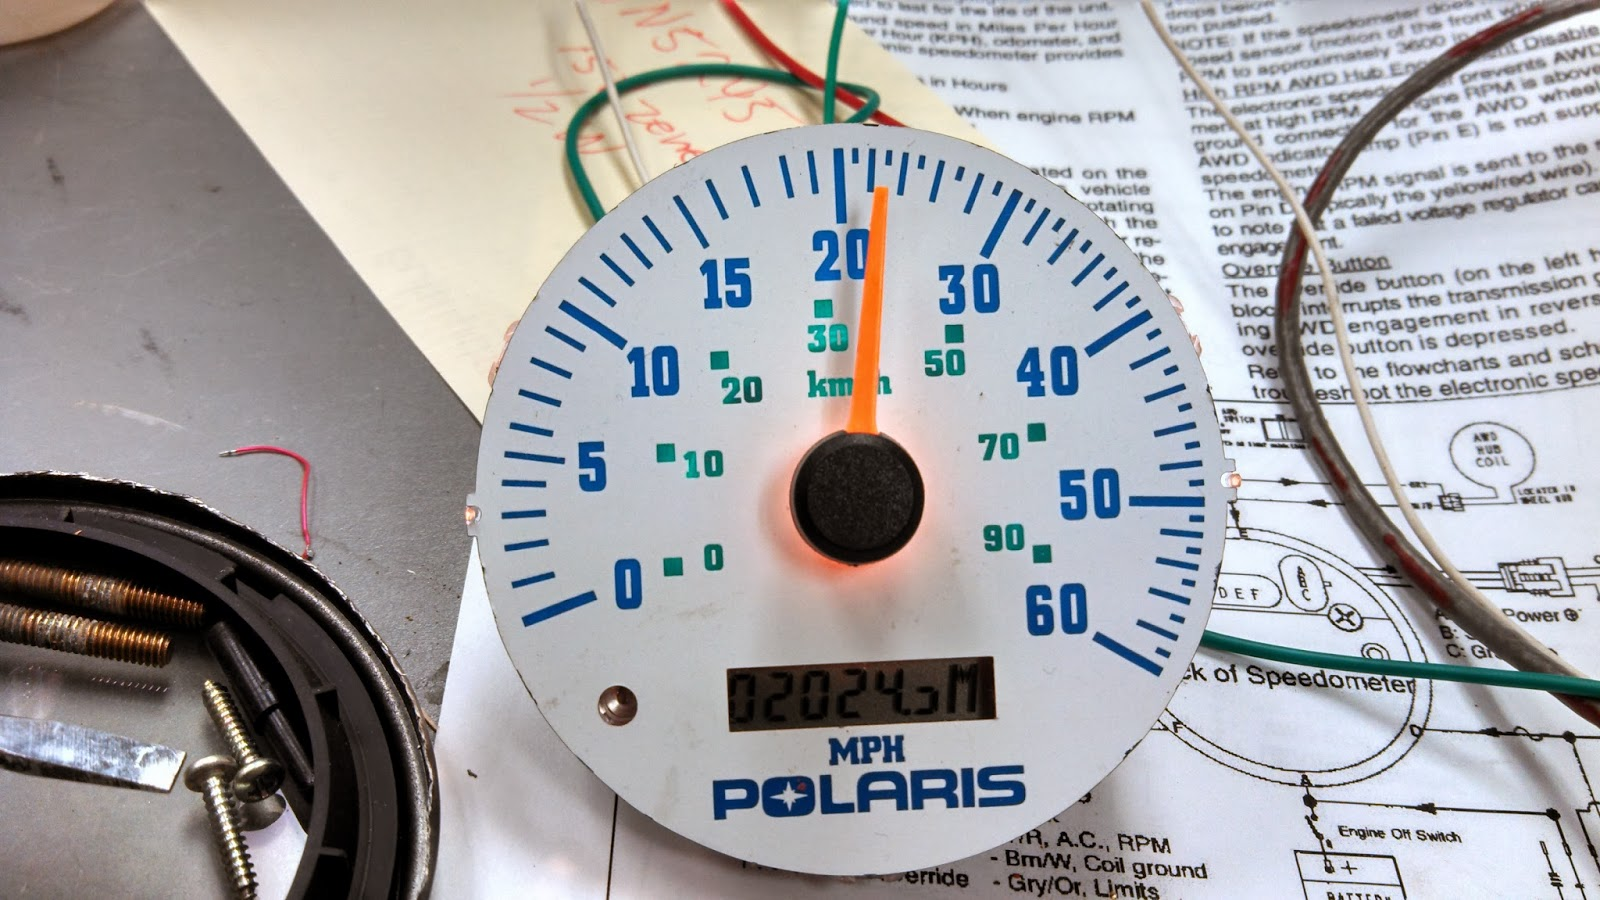 hight resolution of 2001 polaris sportsman 500 awd wiring diagram